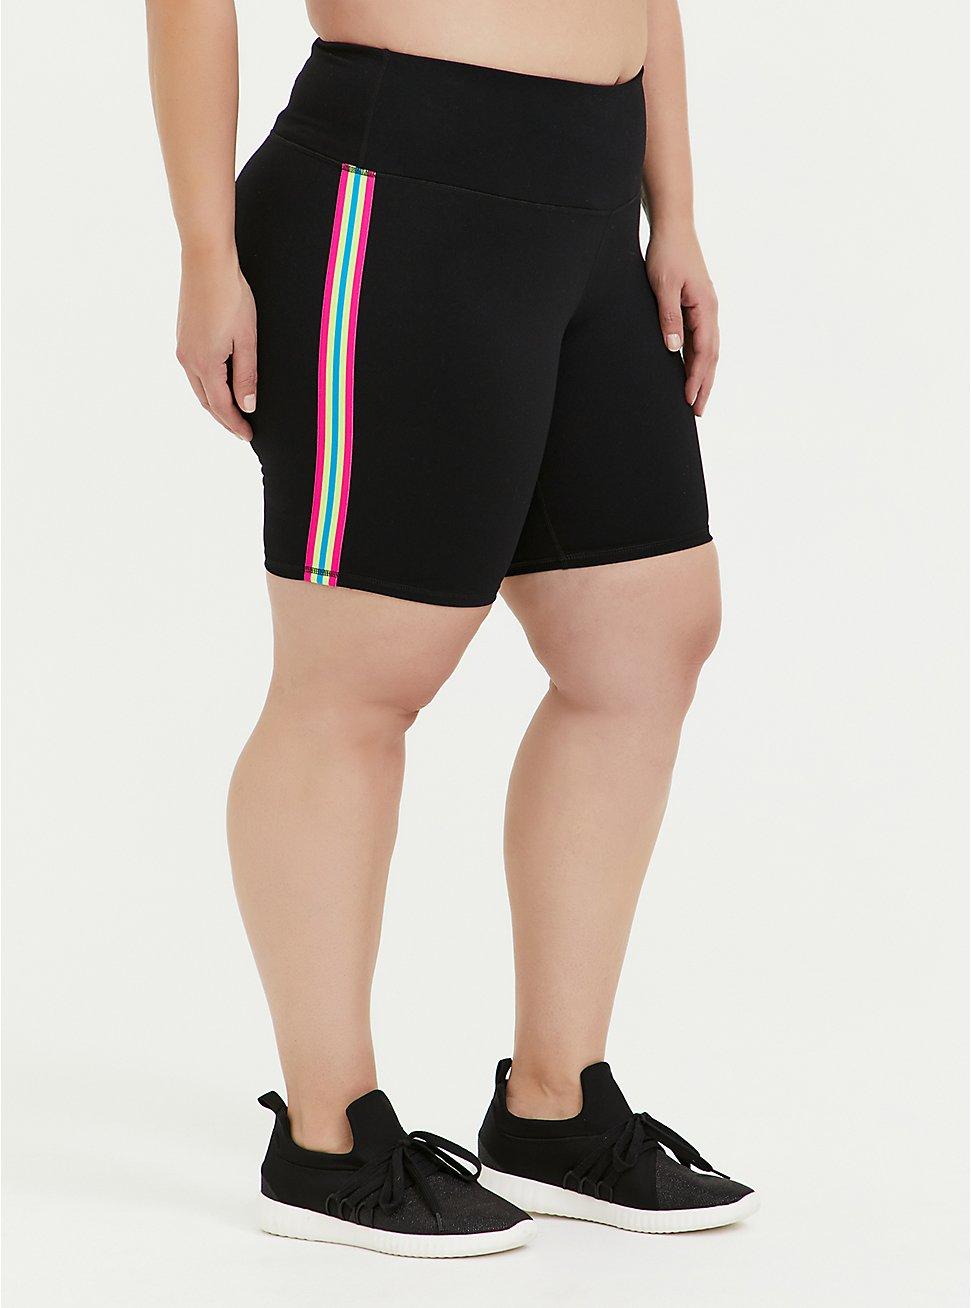 Black & Neon Stripe Wicking Active Bike Short, DEEP BLACK, hi-res